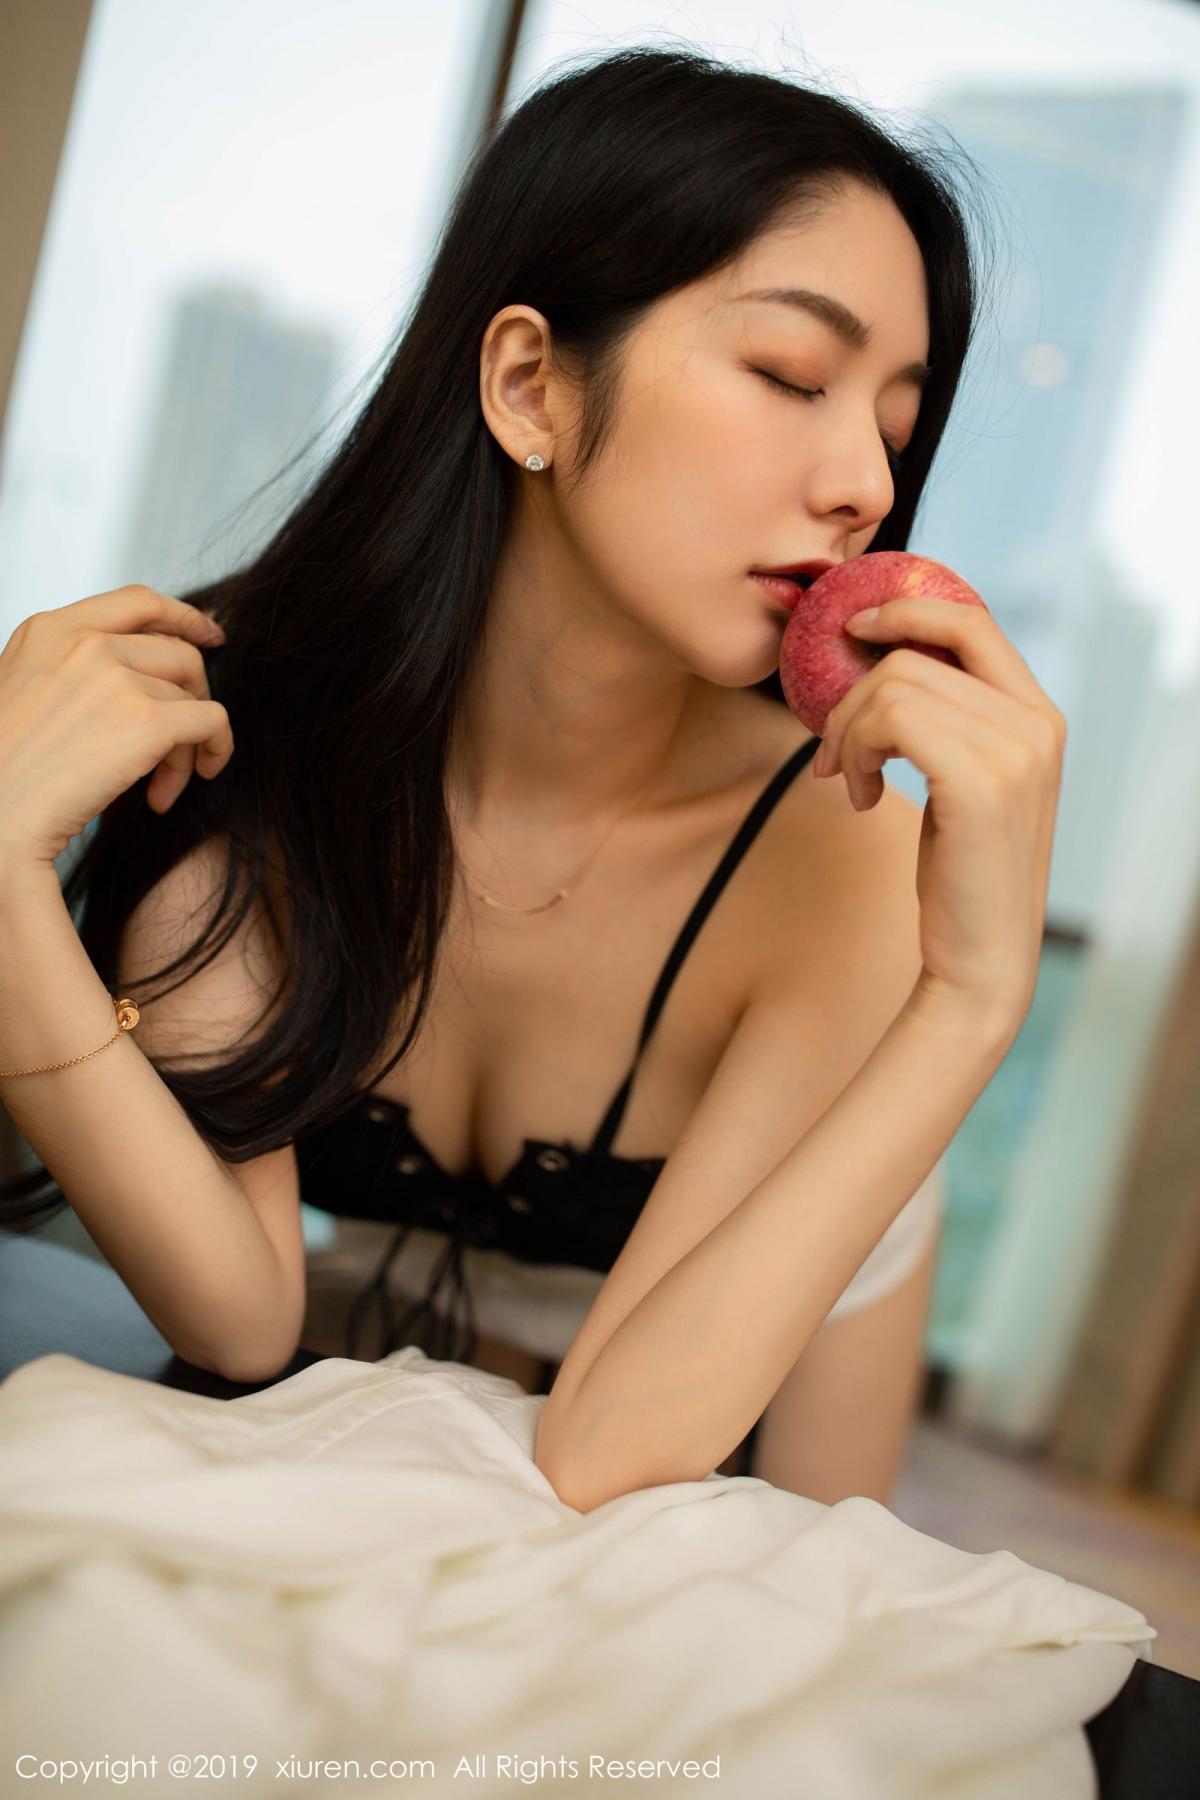 [XiuRen] Vol.1821 Come to my room and sit after you get off work 40P, Black Silk, Di Yi, Xiuren